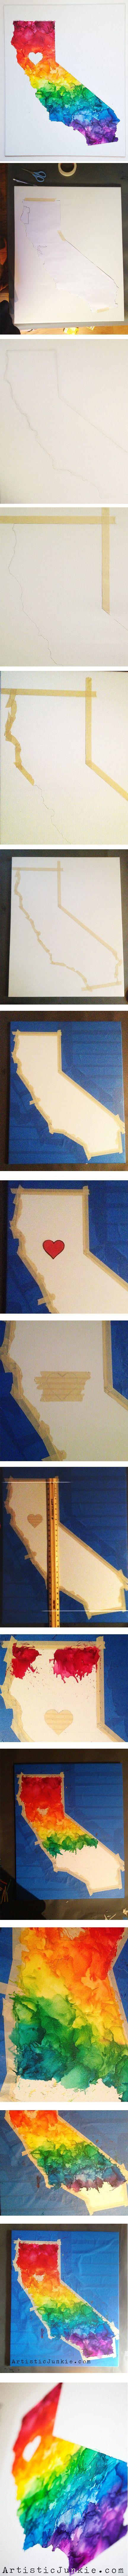 California Love- State Shaped Crayon Art. Full DIY tutorial